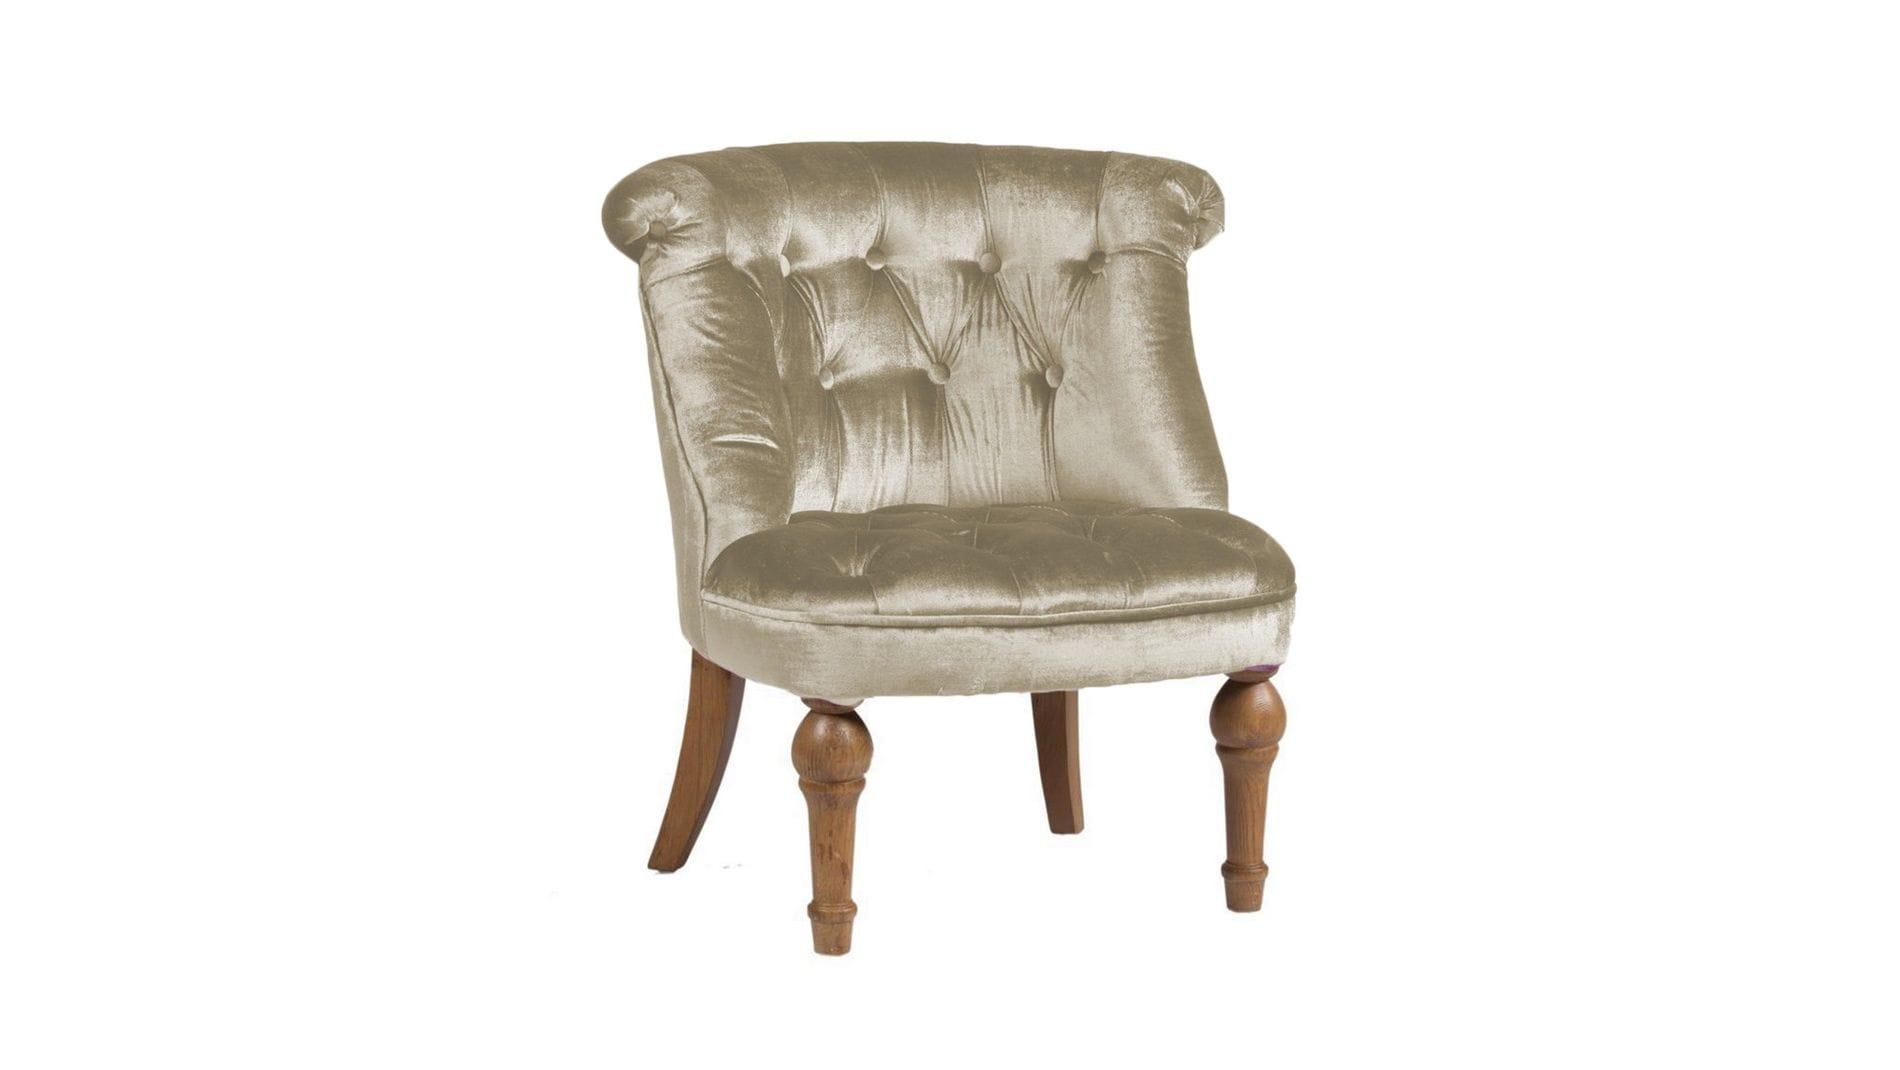 Кресло Sophie Tufted Slipper Chair Молочный Микровелюр М